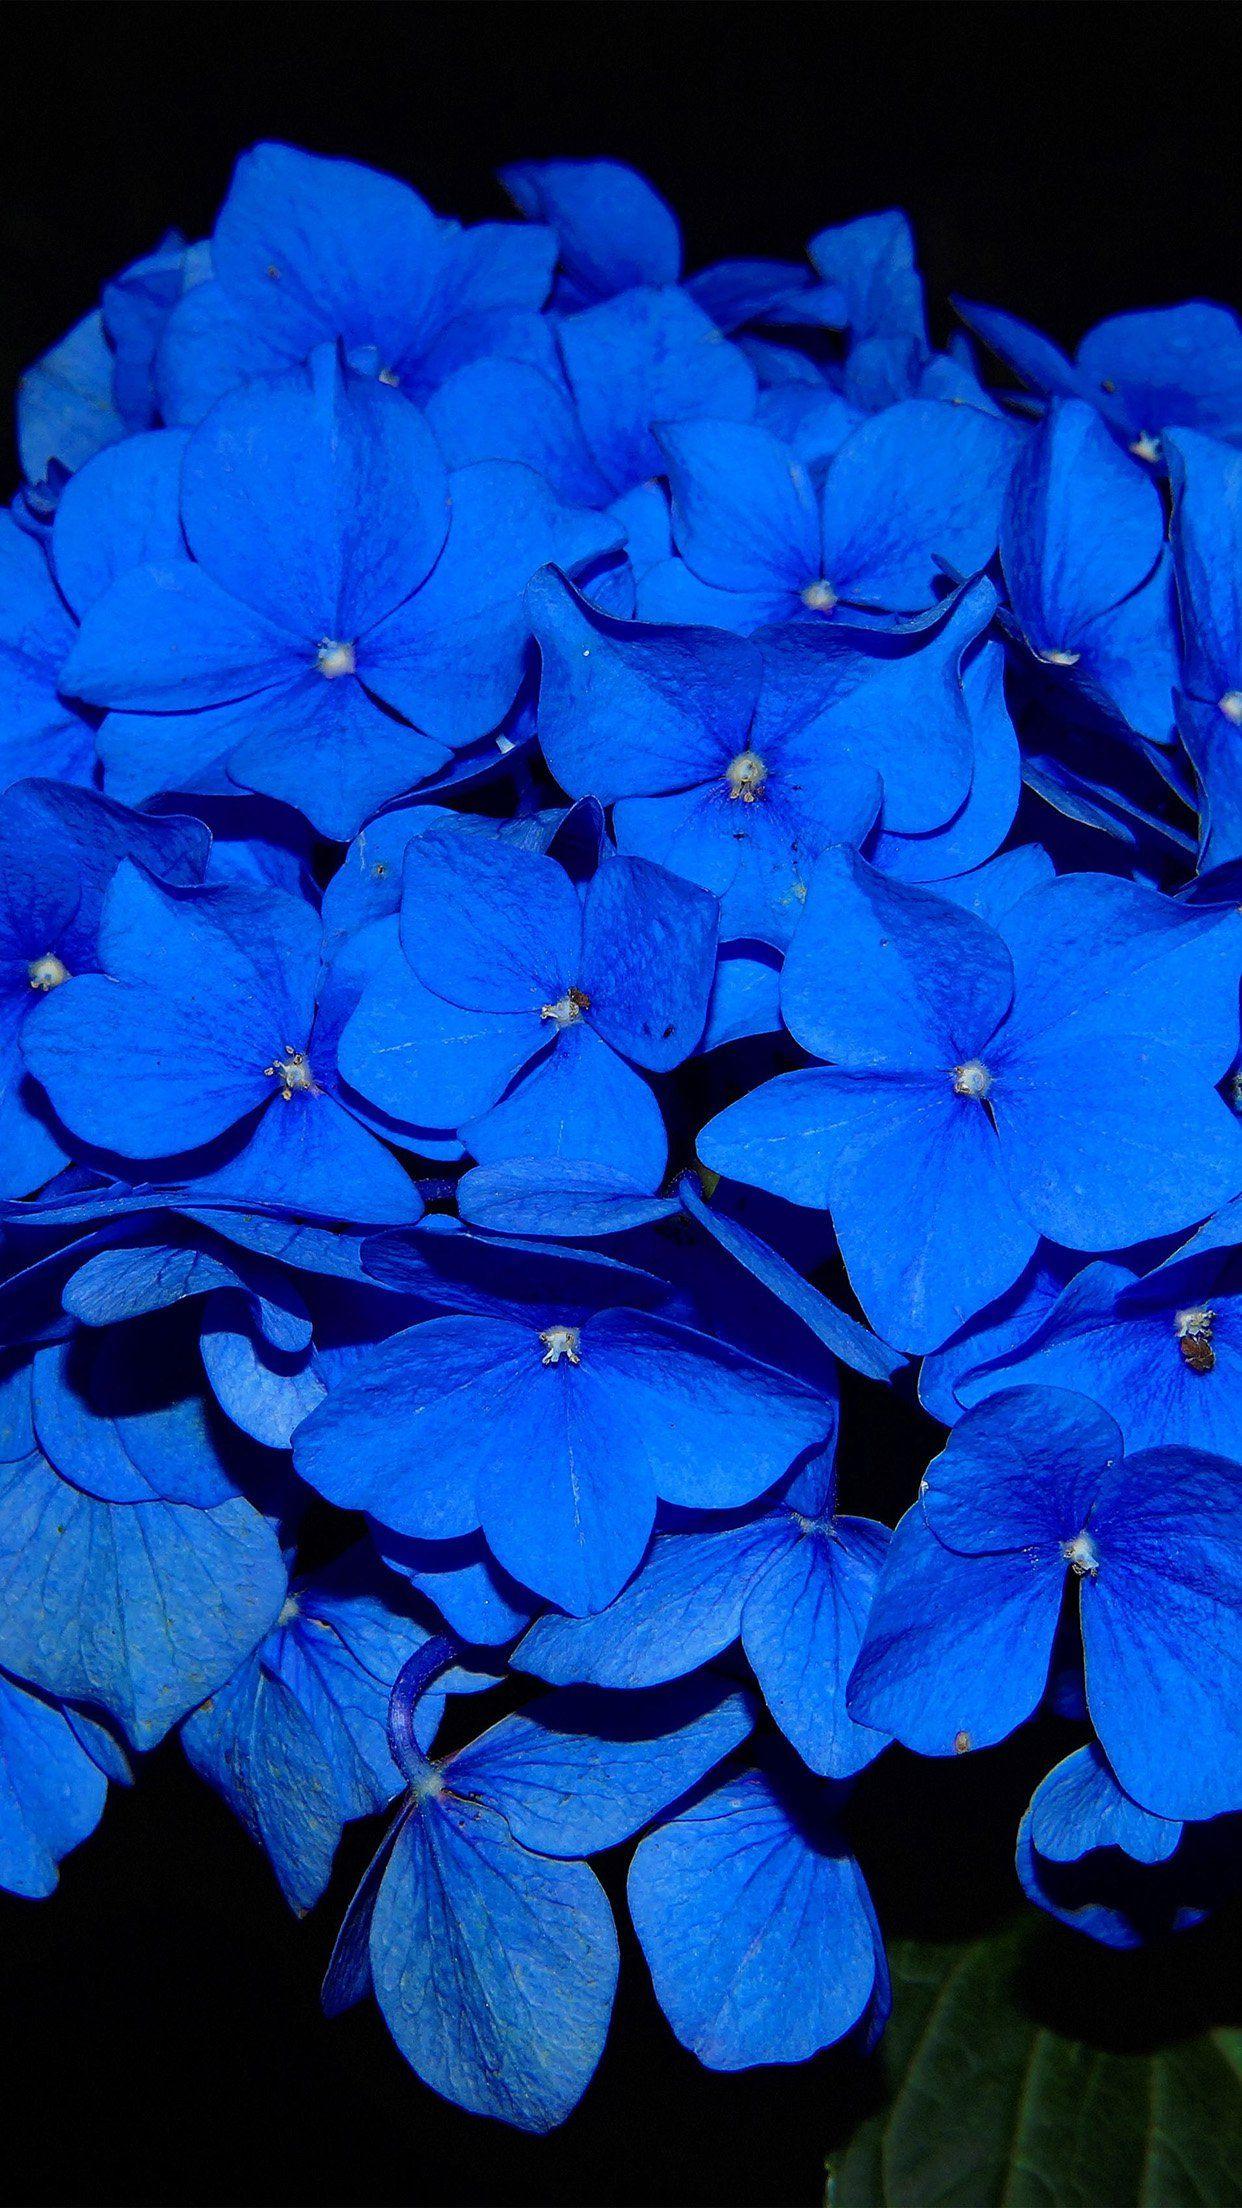 cool hydrangeablossomflowerbluedarknatureiphone6